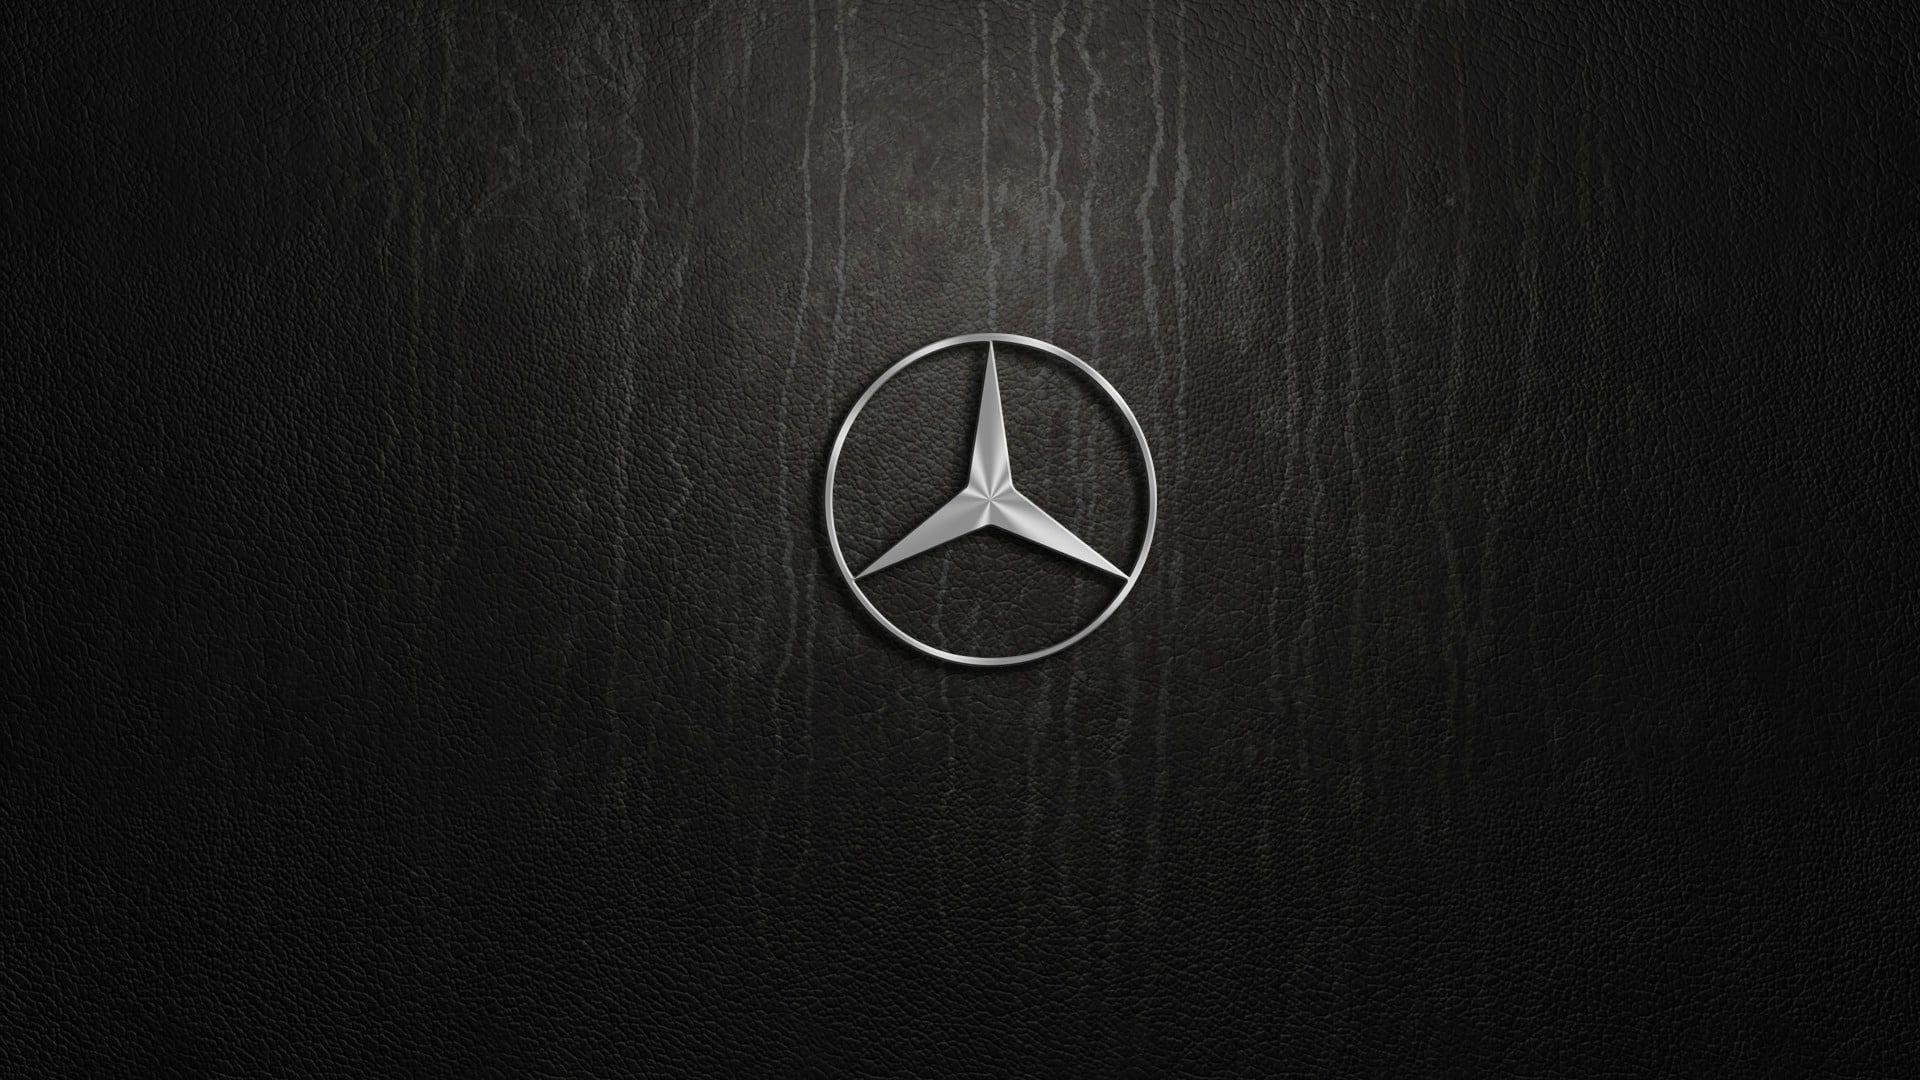 Mercedes Benz Pylon Logo Silver 1080p Wallpaper Hdwallpaper Desktop Mercedes Wallpaper Mercedes Benz Logo Mercedes Benz Wallpaper